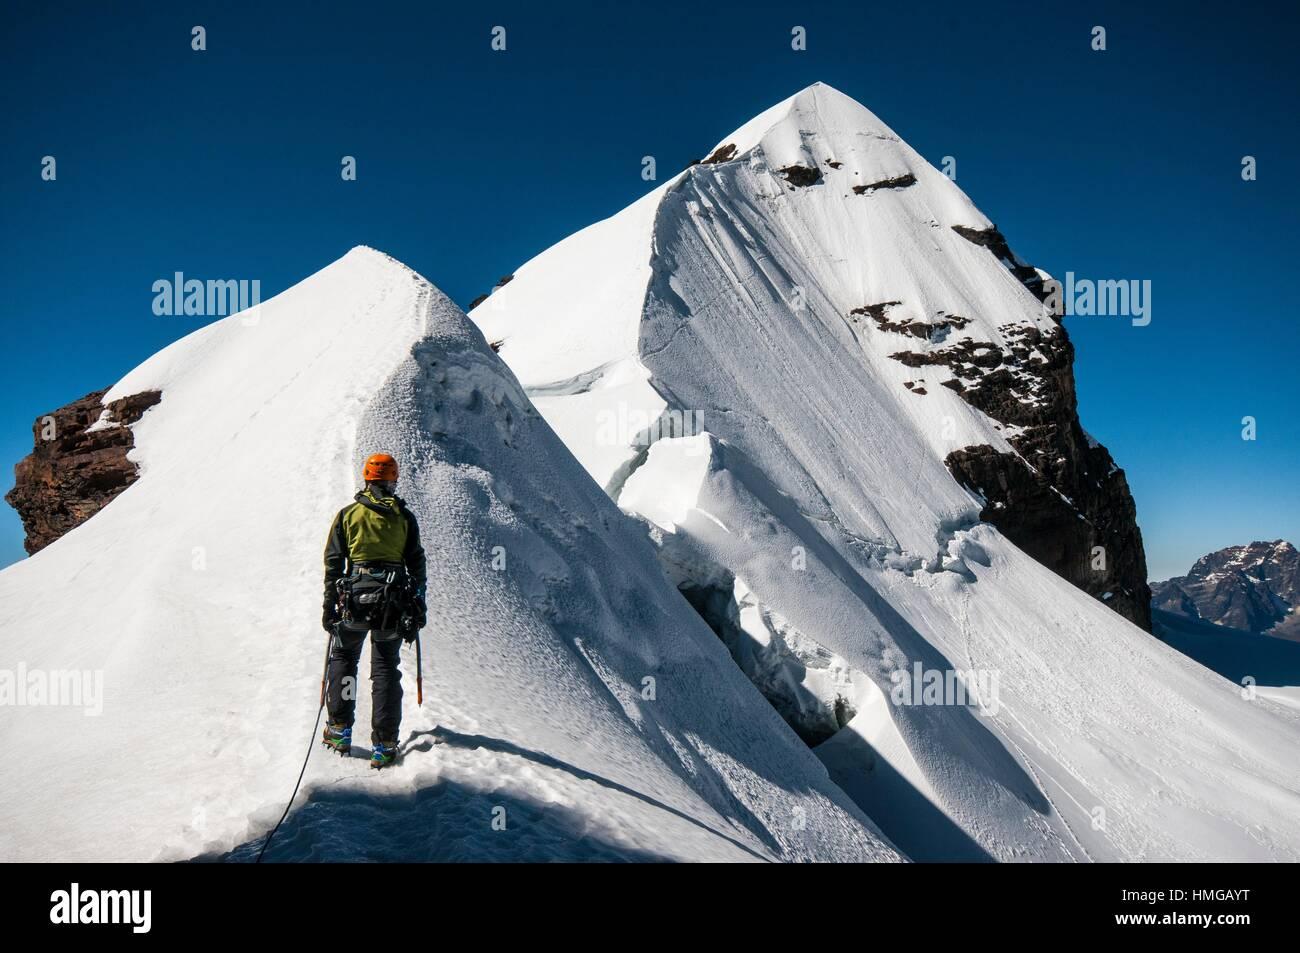 Climber arriving Pequeño Alpamayo summit. Cordillera Real range, Andes. Bolivia. South America - Stock Image